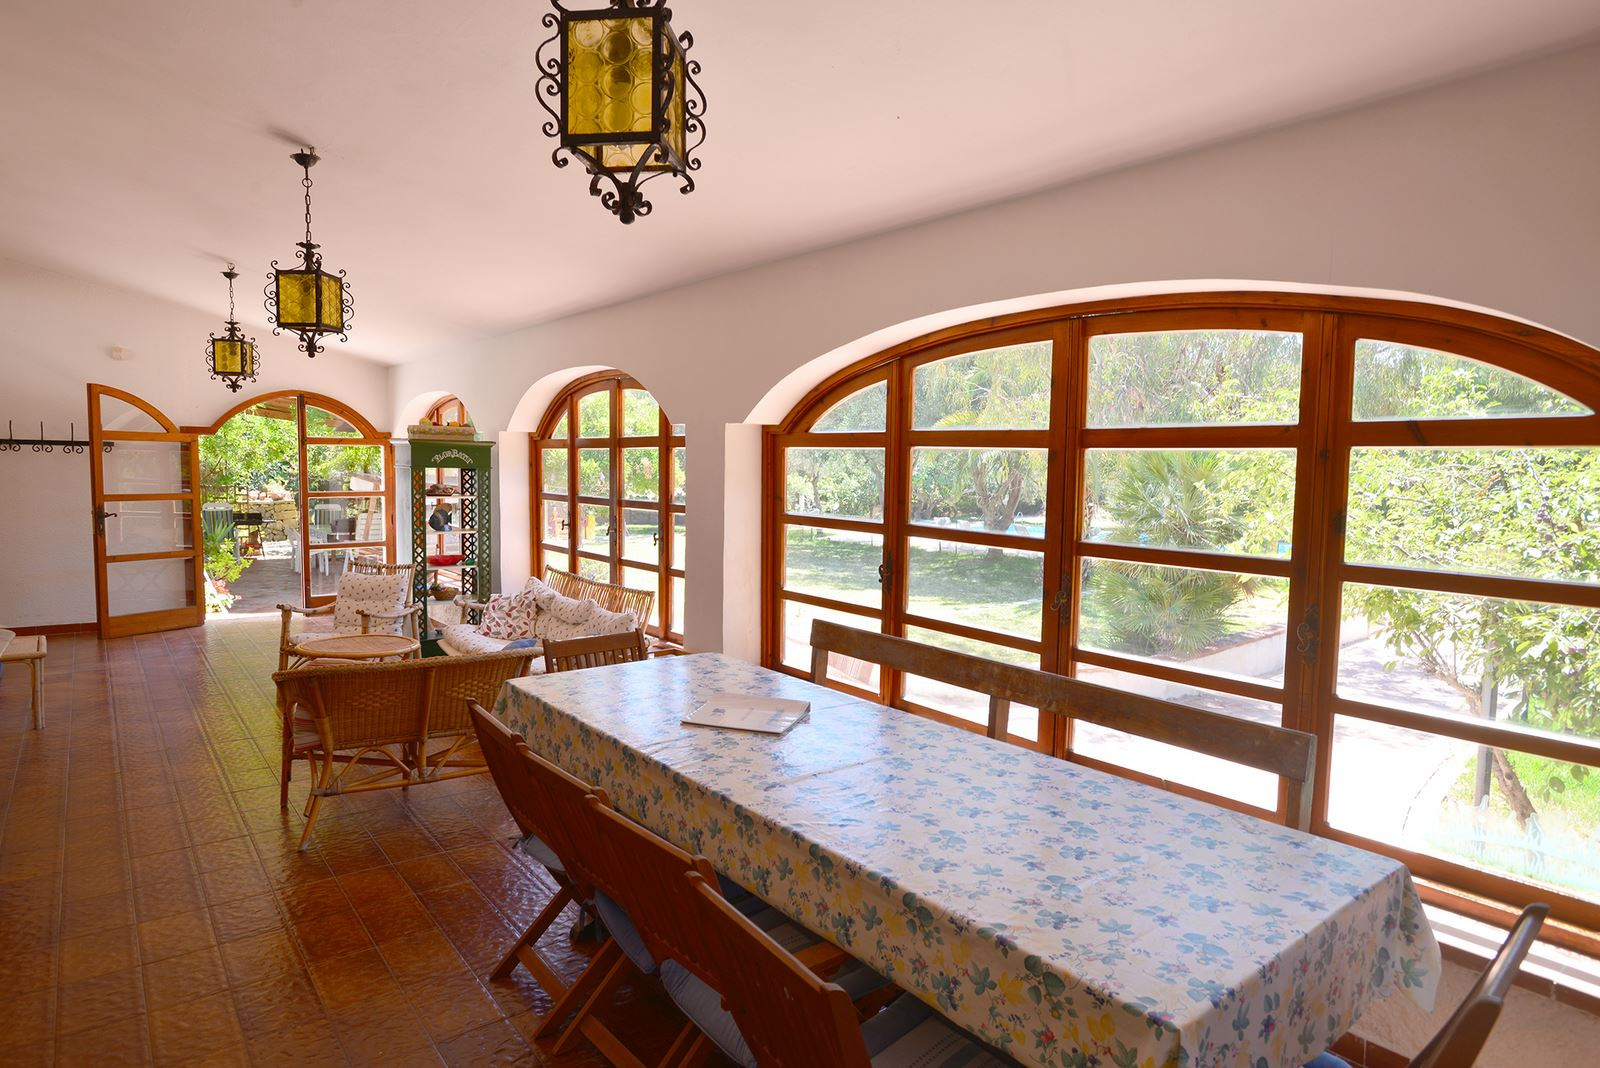 Maison de vacances Casa Fanusa (870904), Siracusa, Siracusa, Sicile, Italie, image 22